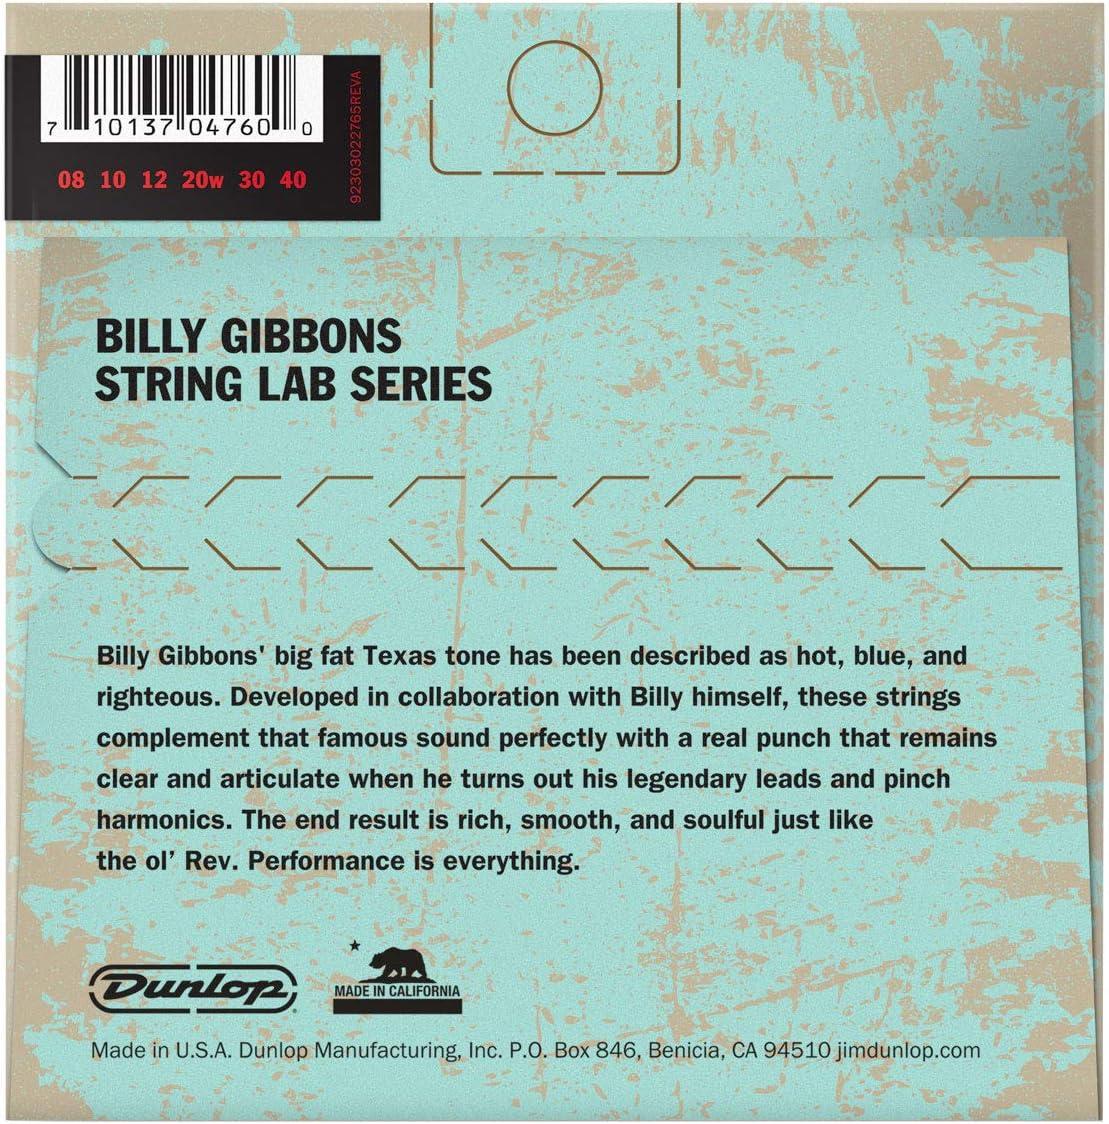 Willys Nickel Wound Guitar Strings 0.08-0.40 6-Strings Dunlop RWN0840 Billy Gibbons Rev